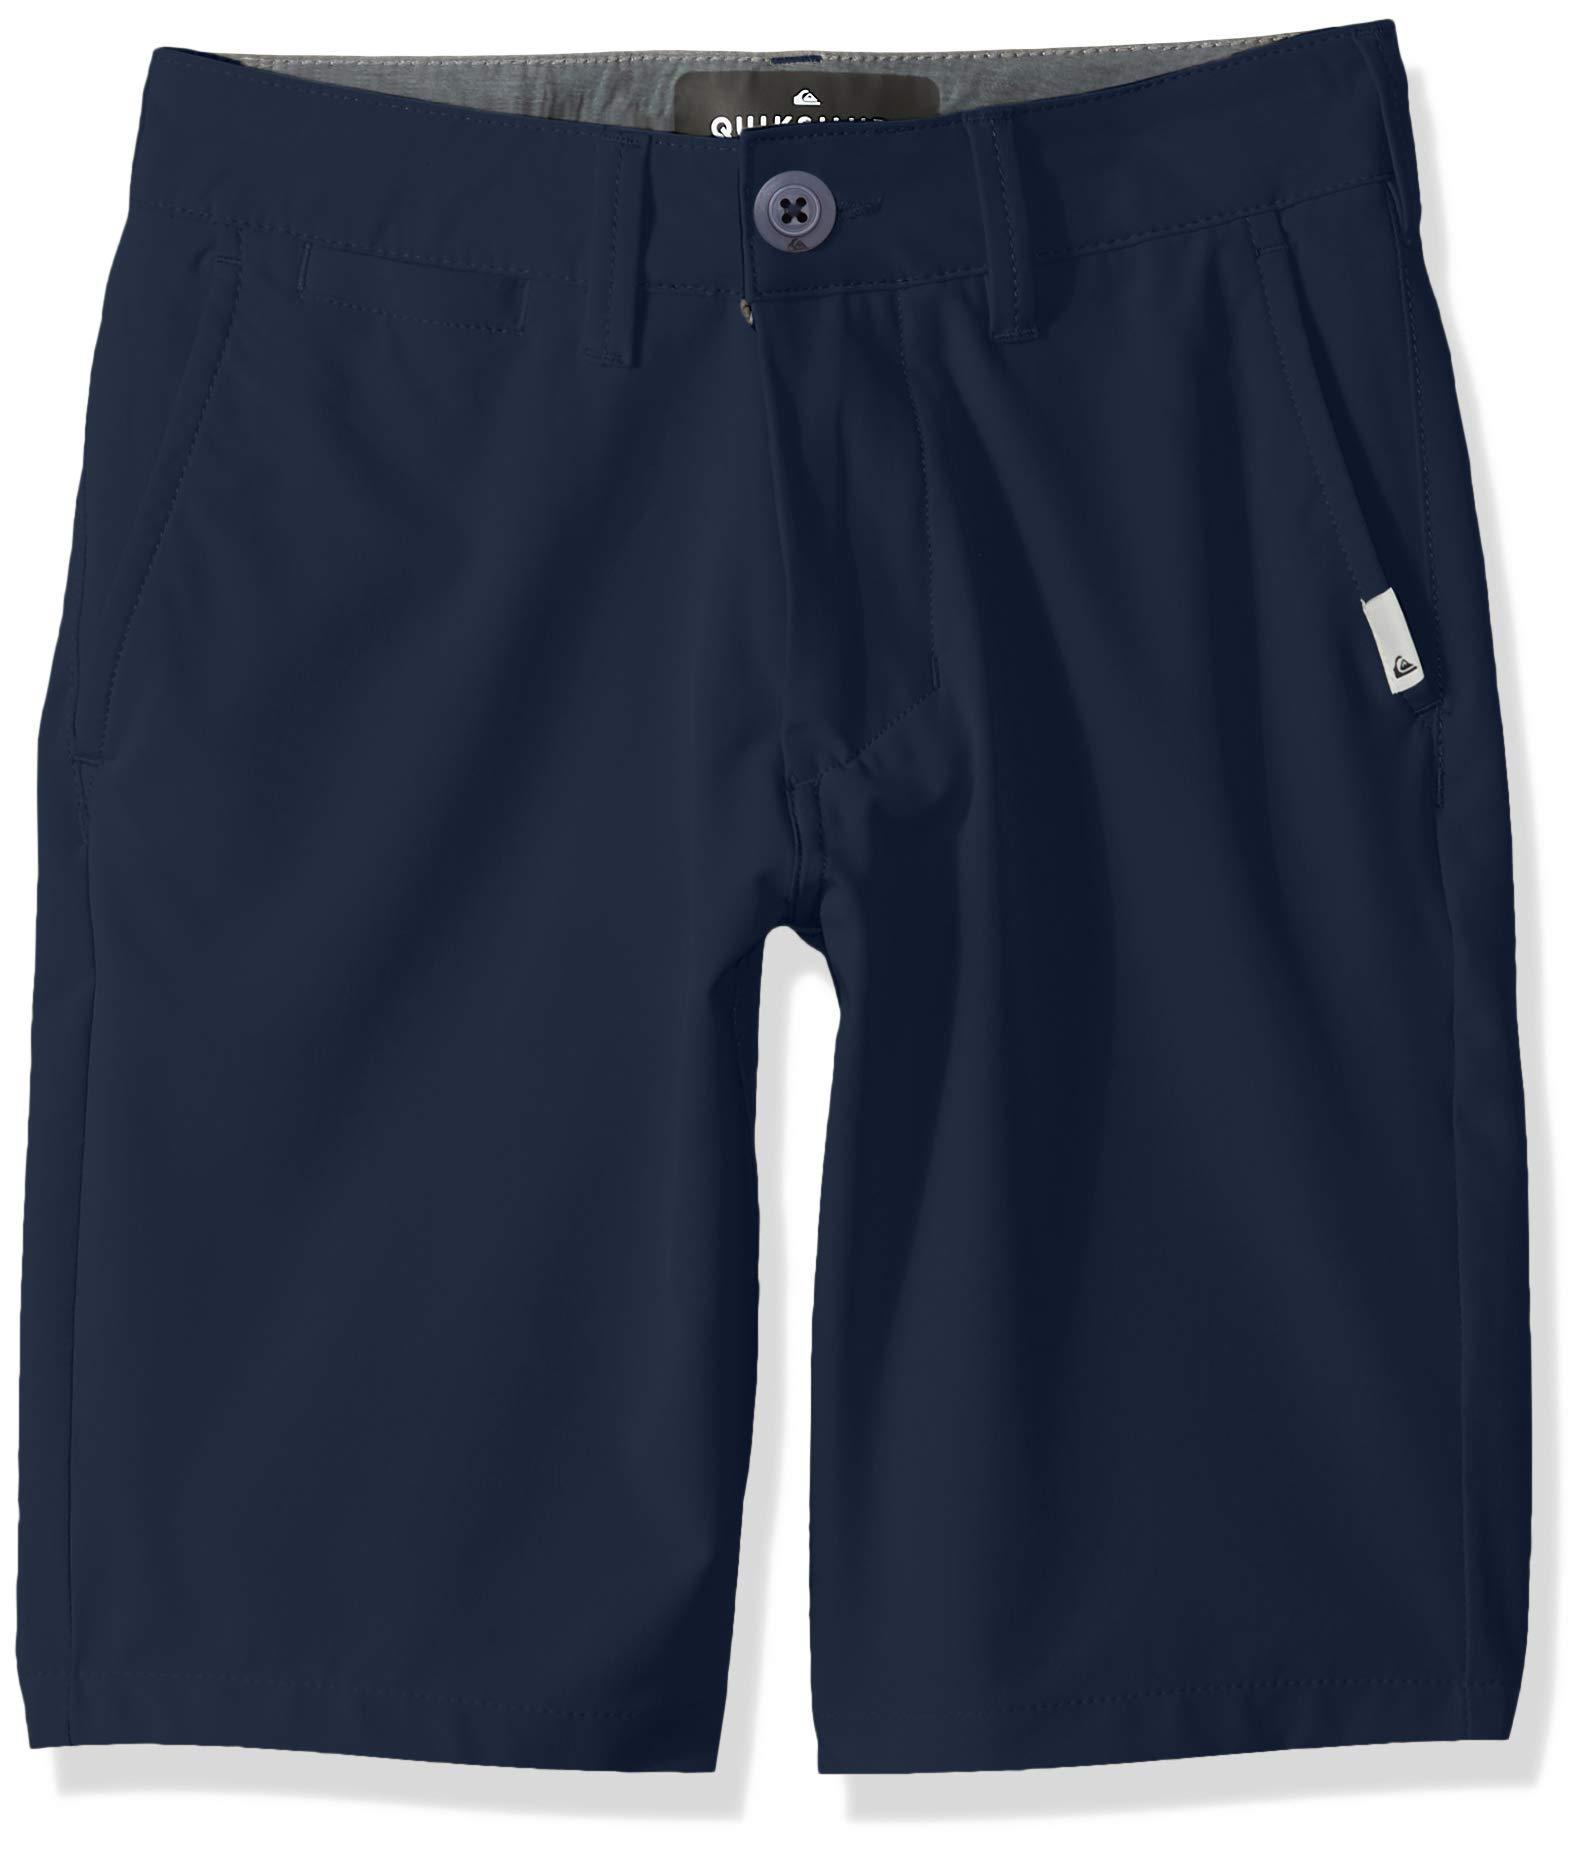 Quiksilver Boys' Big Union Amphibian Youth 19 Hybrid Short, Navy Blazer 25/10